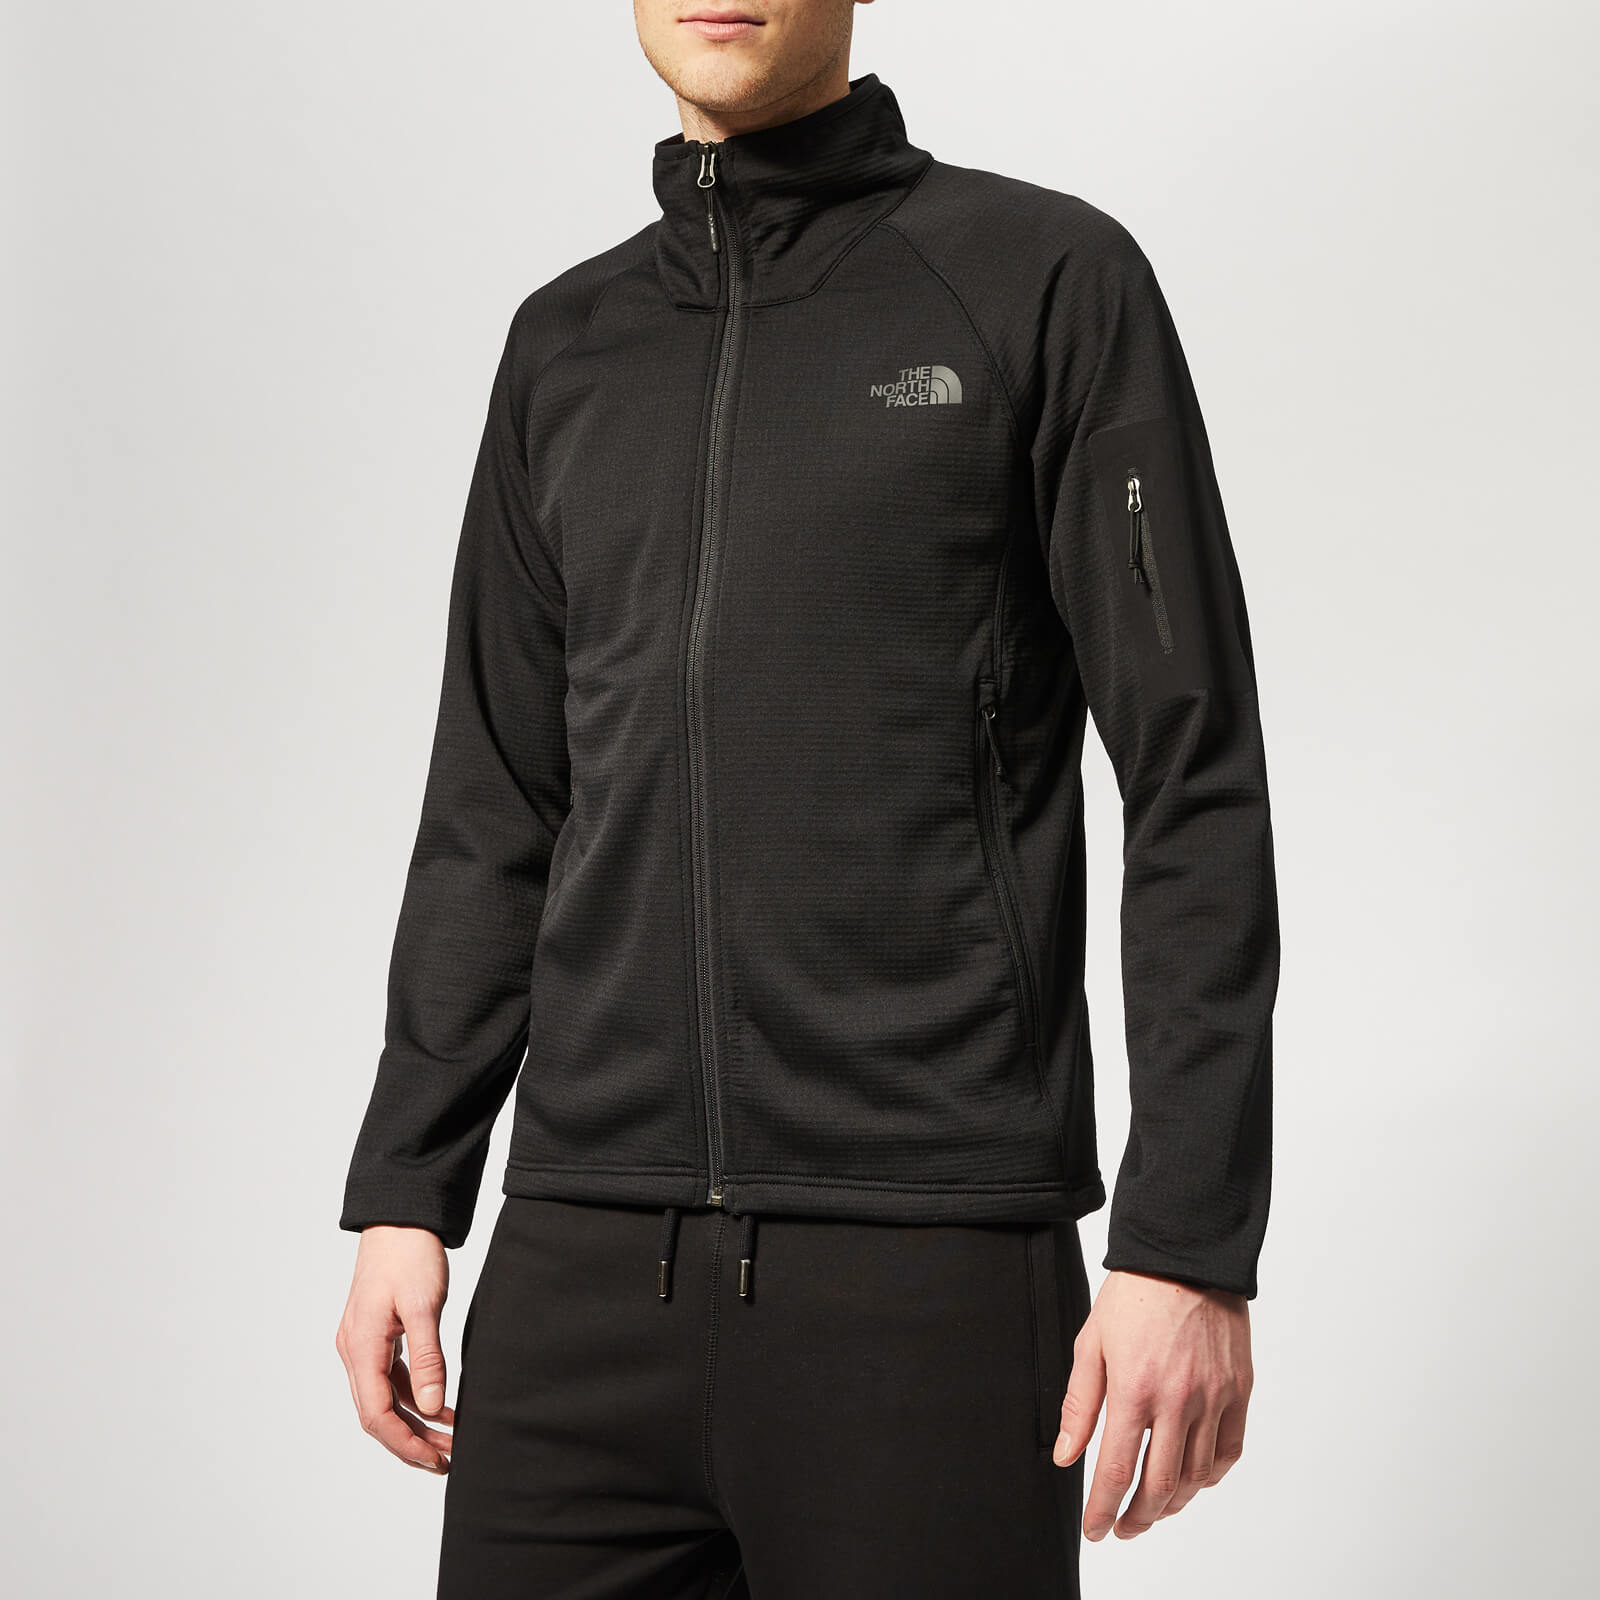 b7d79972a The North Face Men's Borod Full Zip Jacket - TNF Black